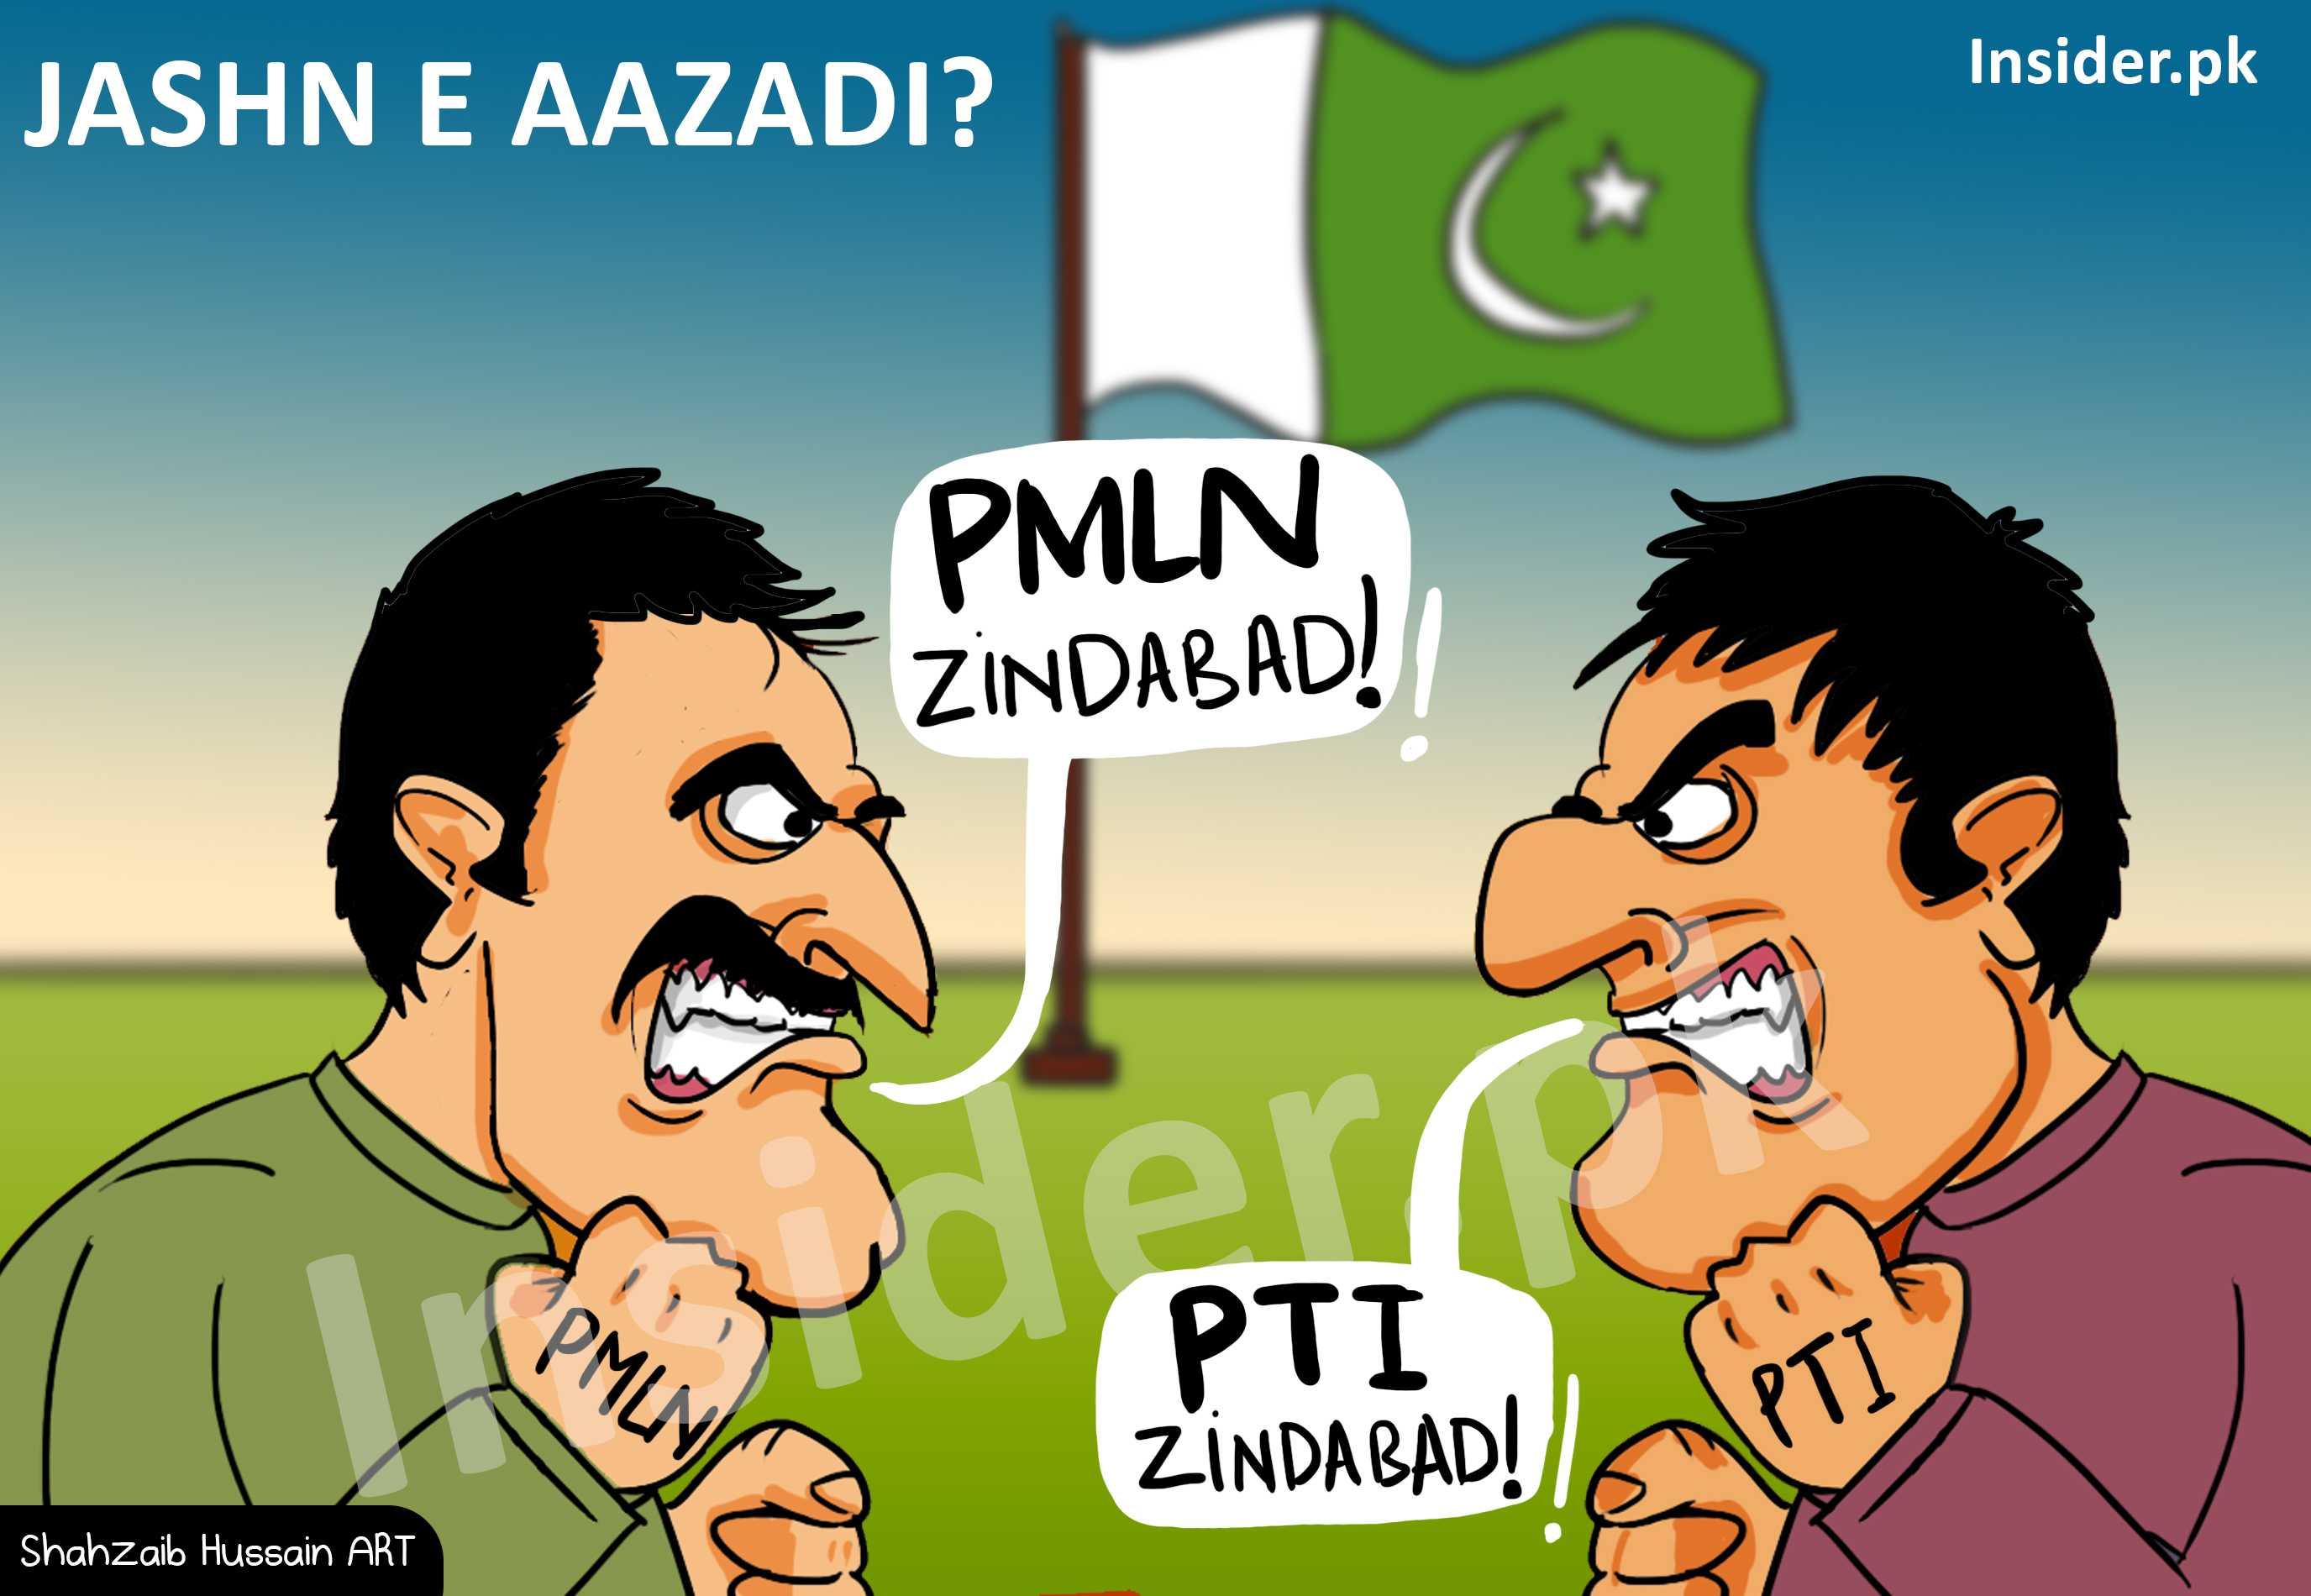 Illustration: PTI, PMLN or Pakistan?